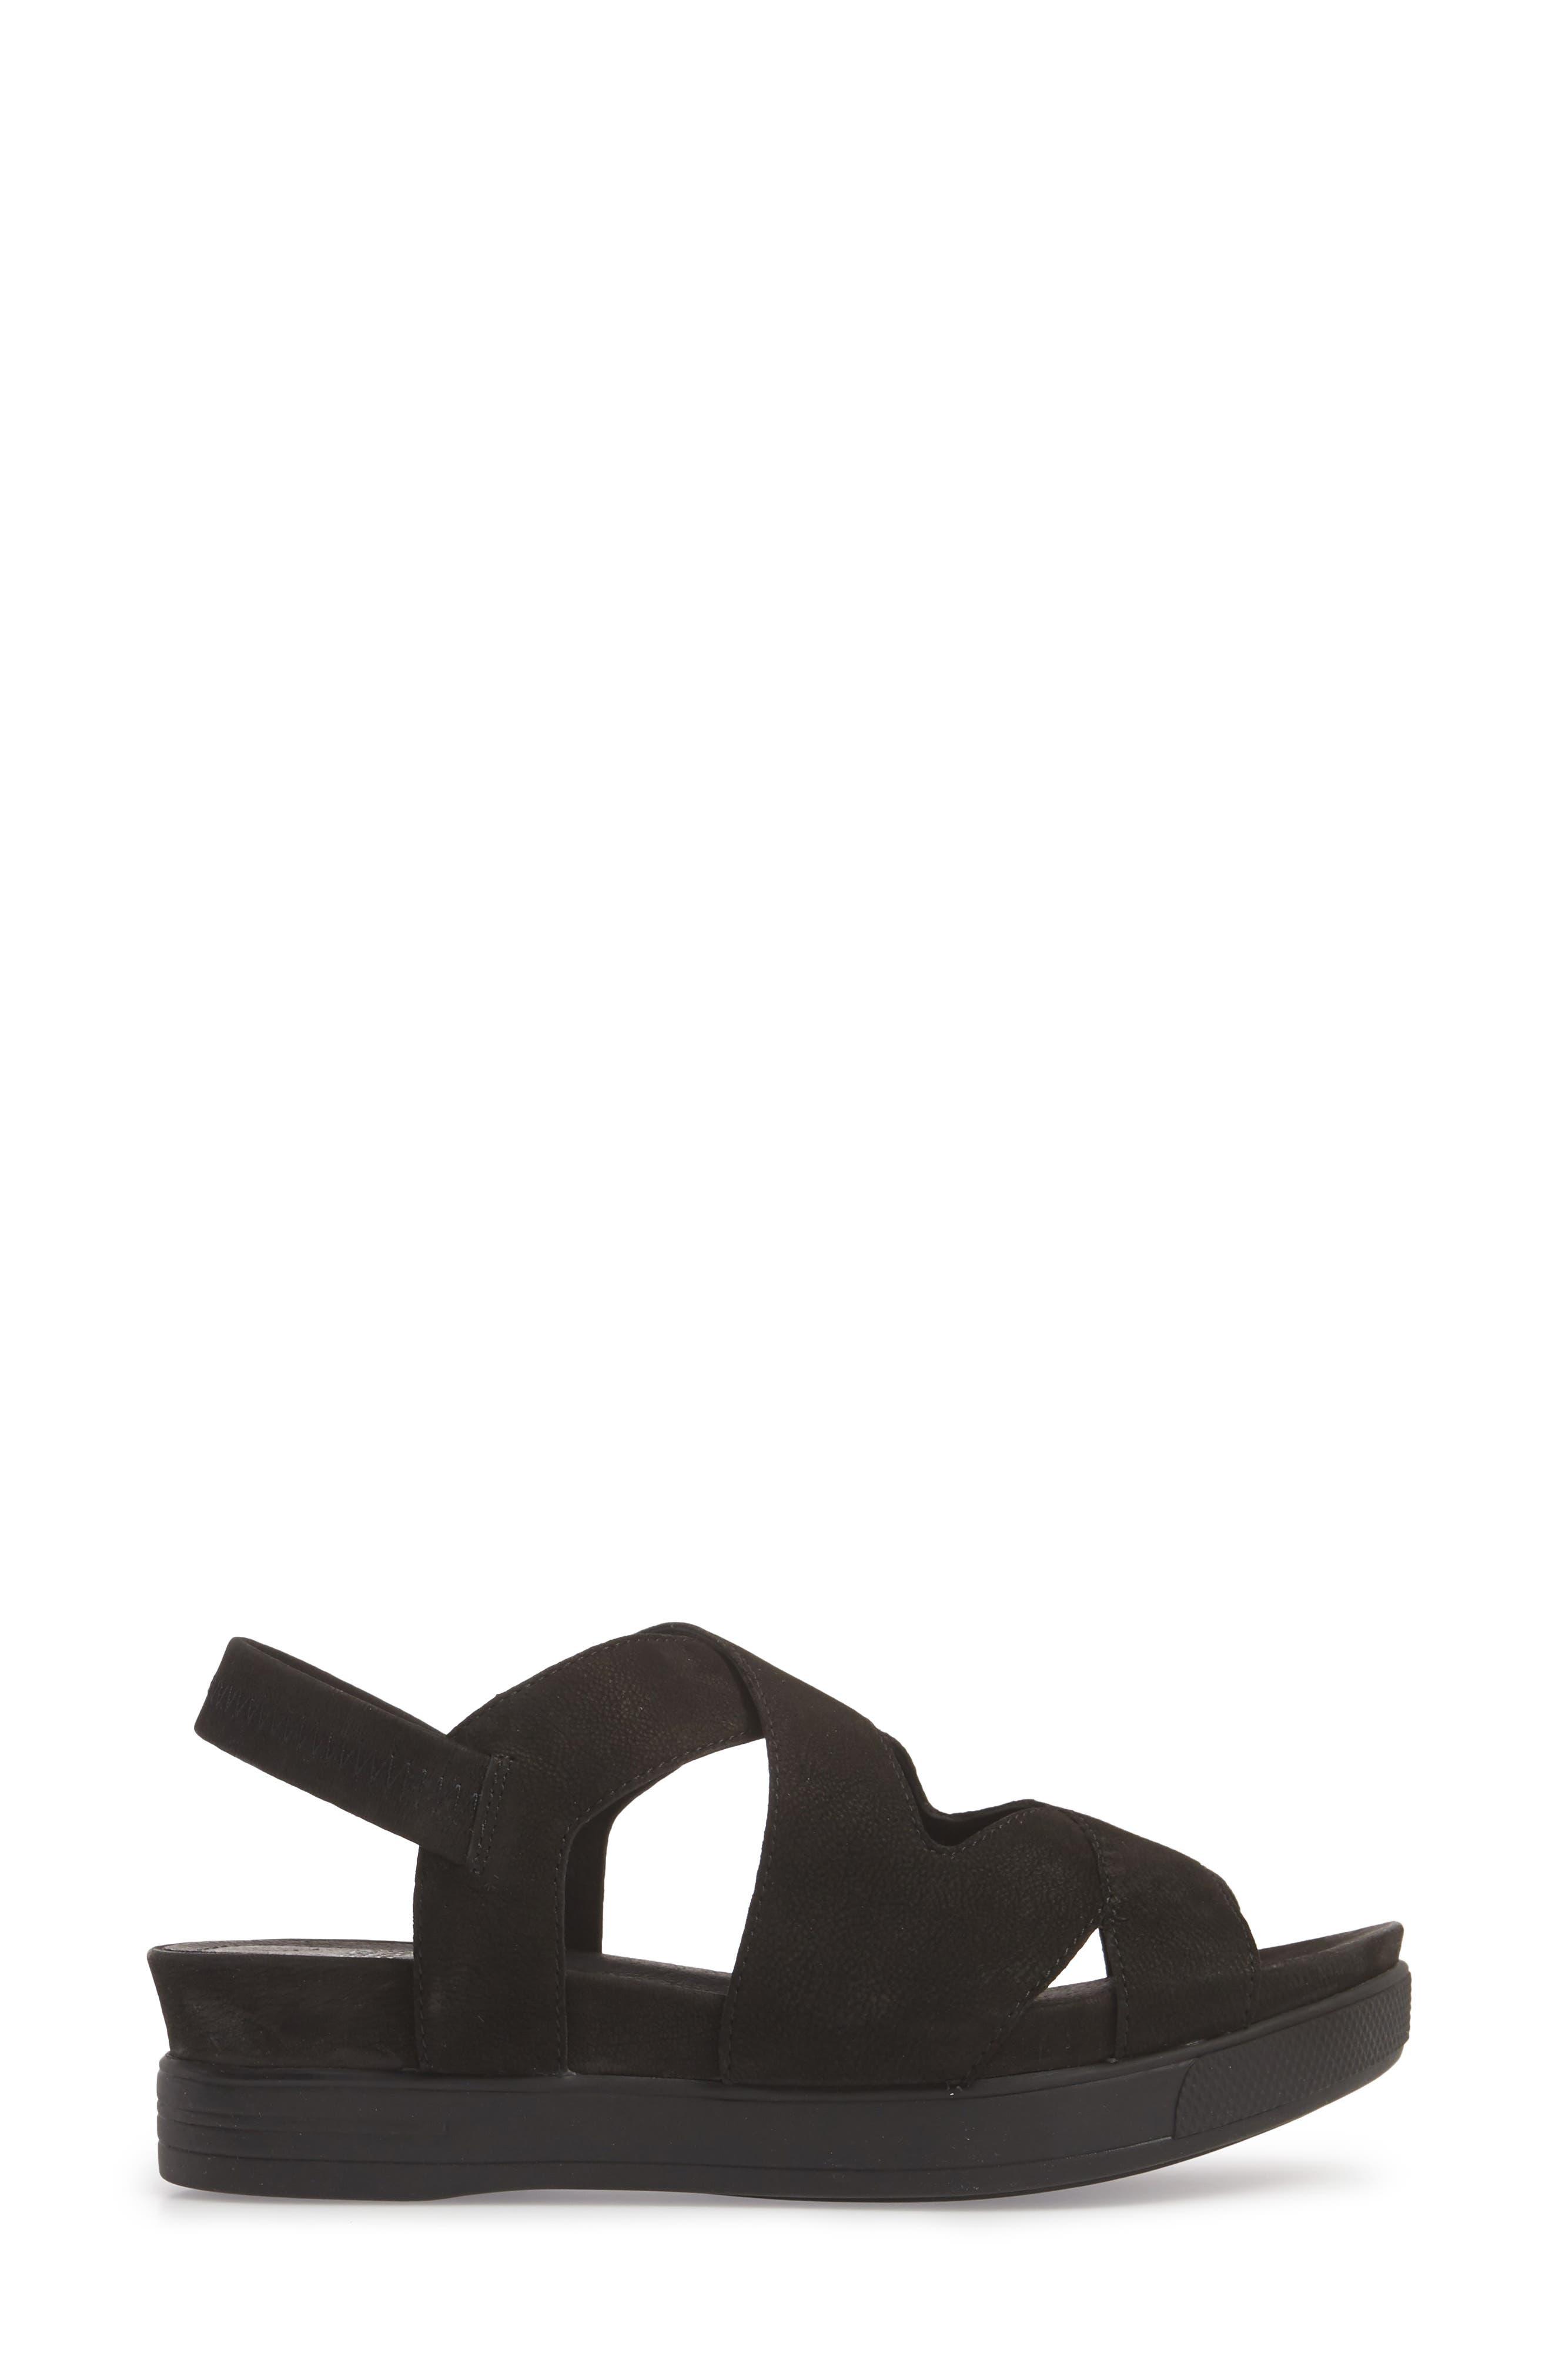 Sonny Sandal,                             Alternate thumbnail 3, color,                             Black Nubuck Leather